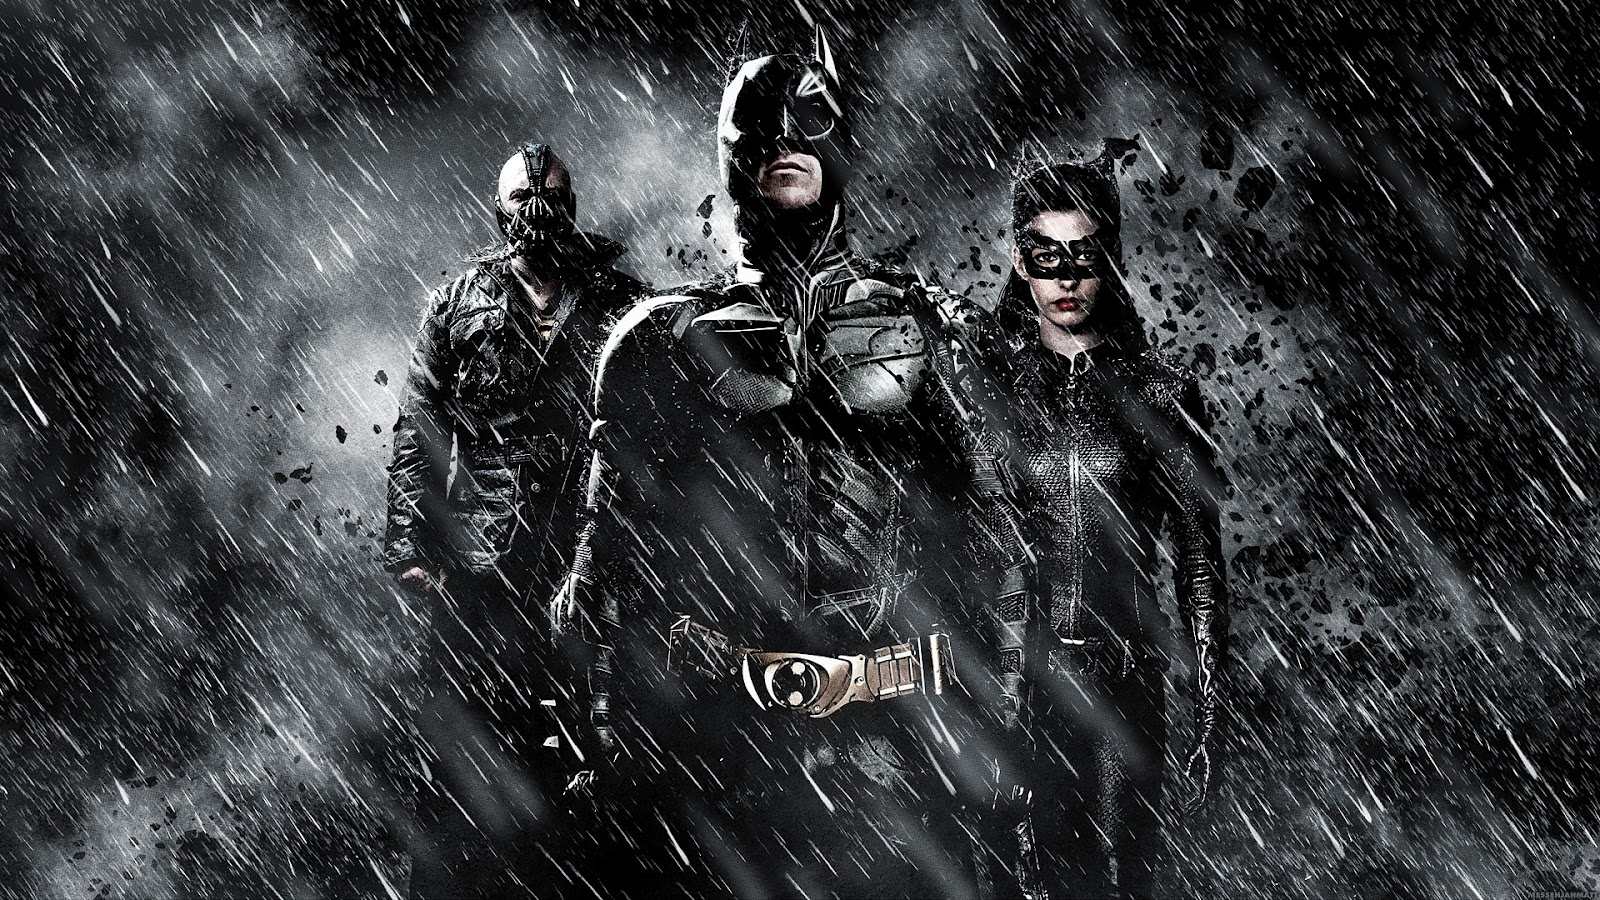 Batman-The-Dark-Knight-Rises_Wallpapers-HD